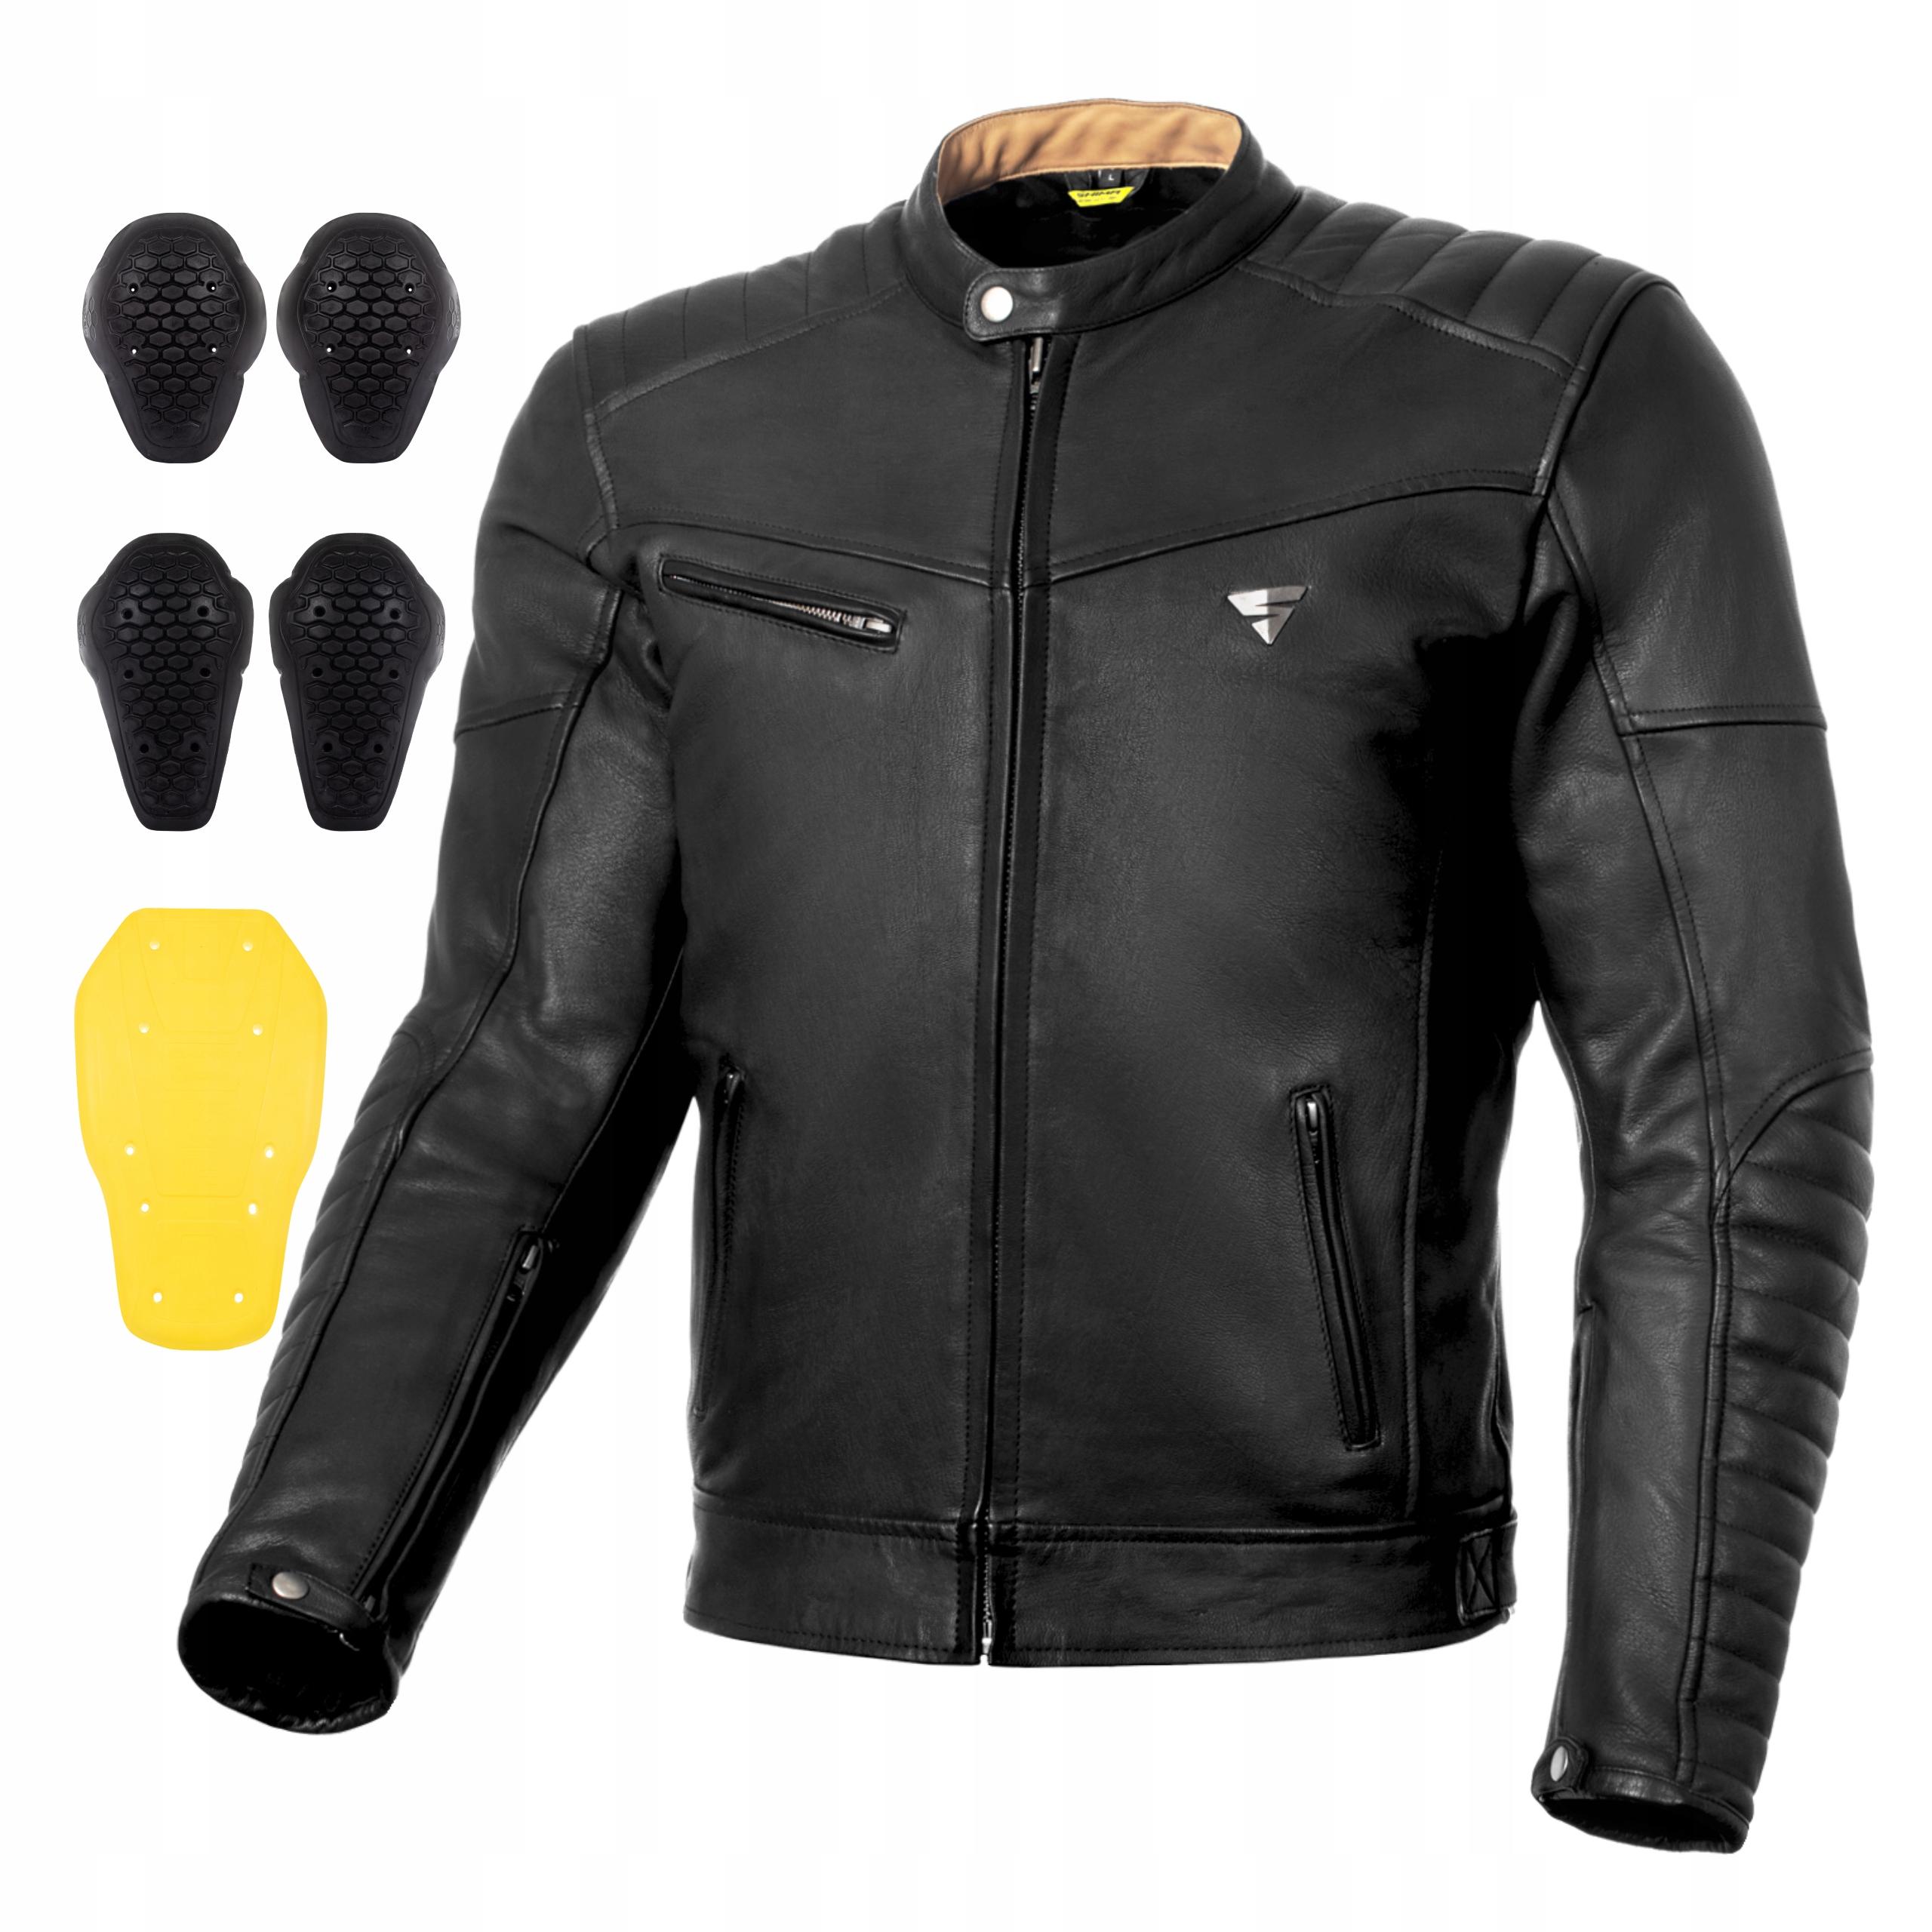 Мотоциклетная куртка SHIMA WINCHESTER BLACK + БЕСПЛАТНО